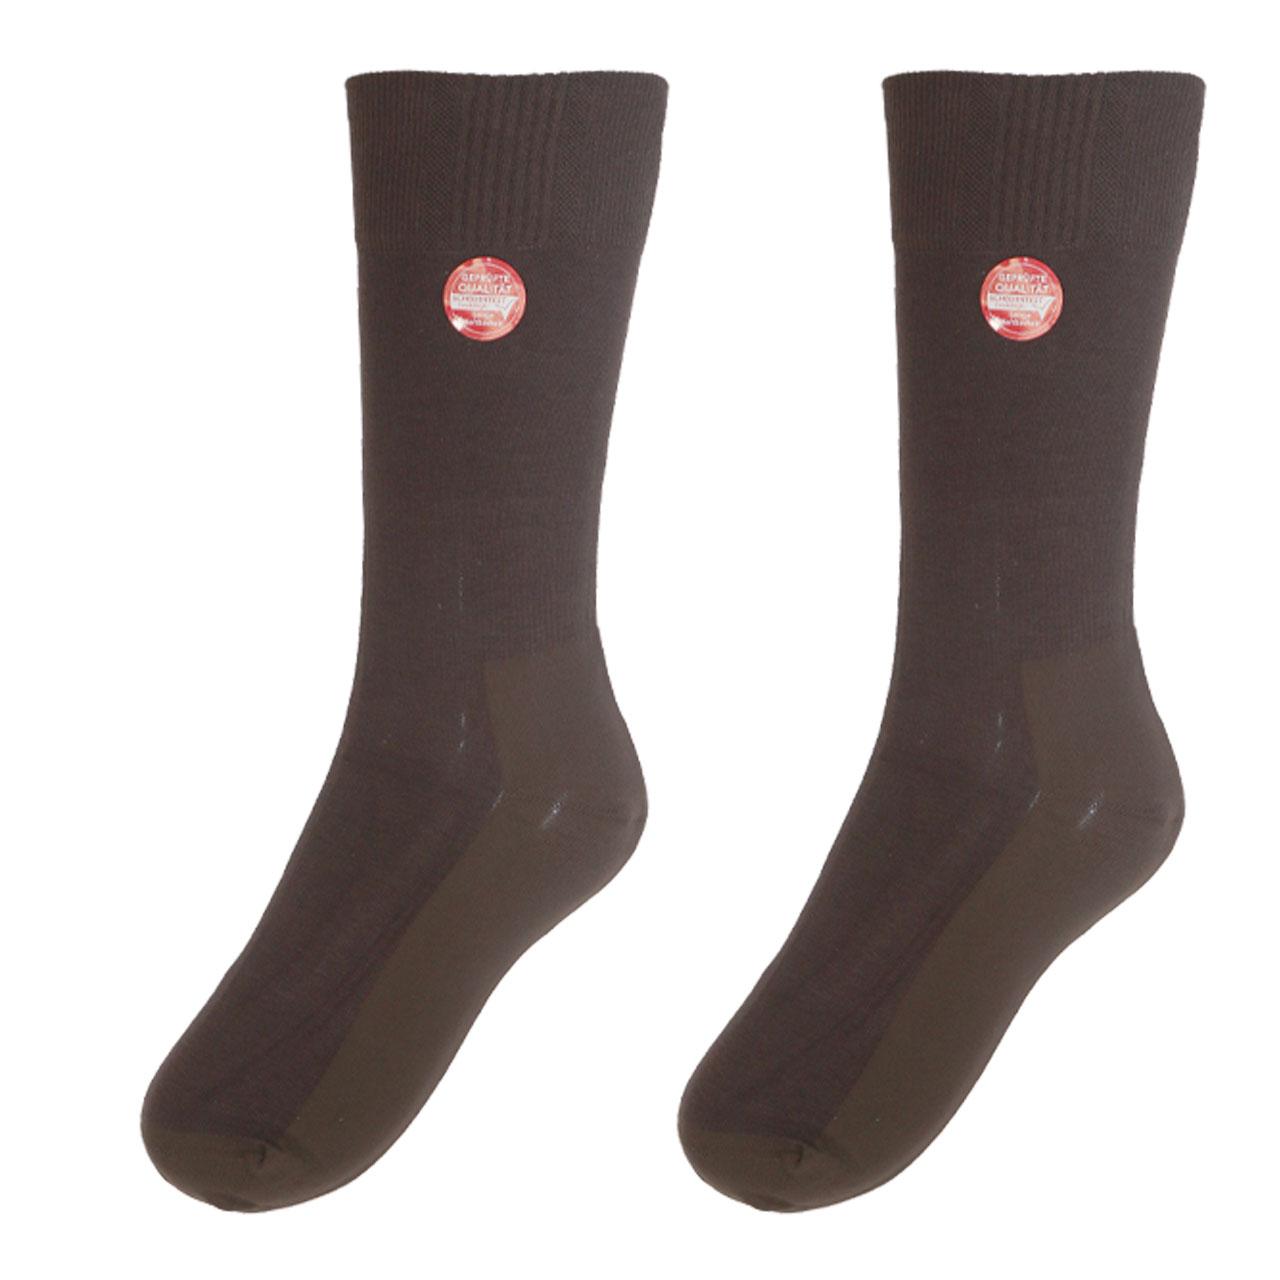 جوراب مردانه نوردای مدل بامبو  مشکی 495554 بسته 3 عددی